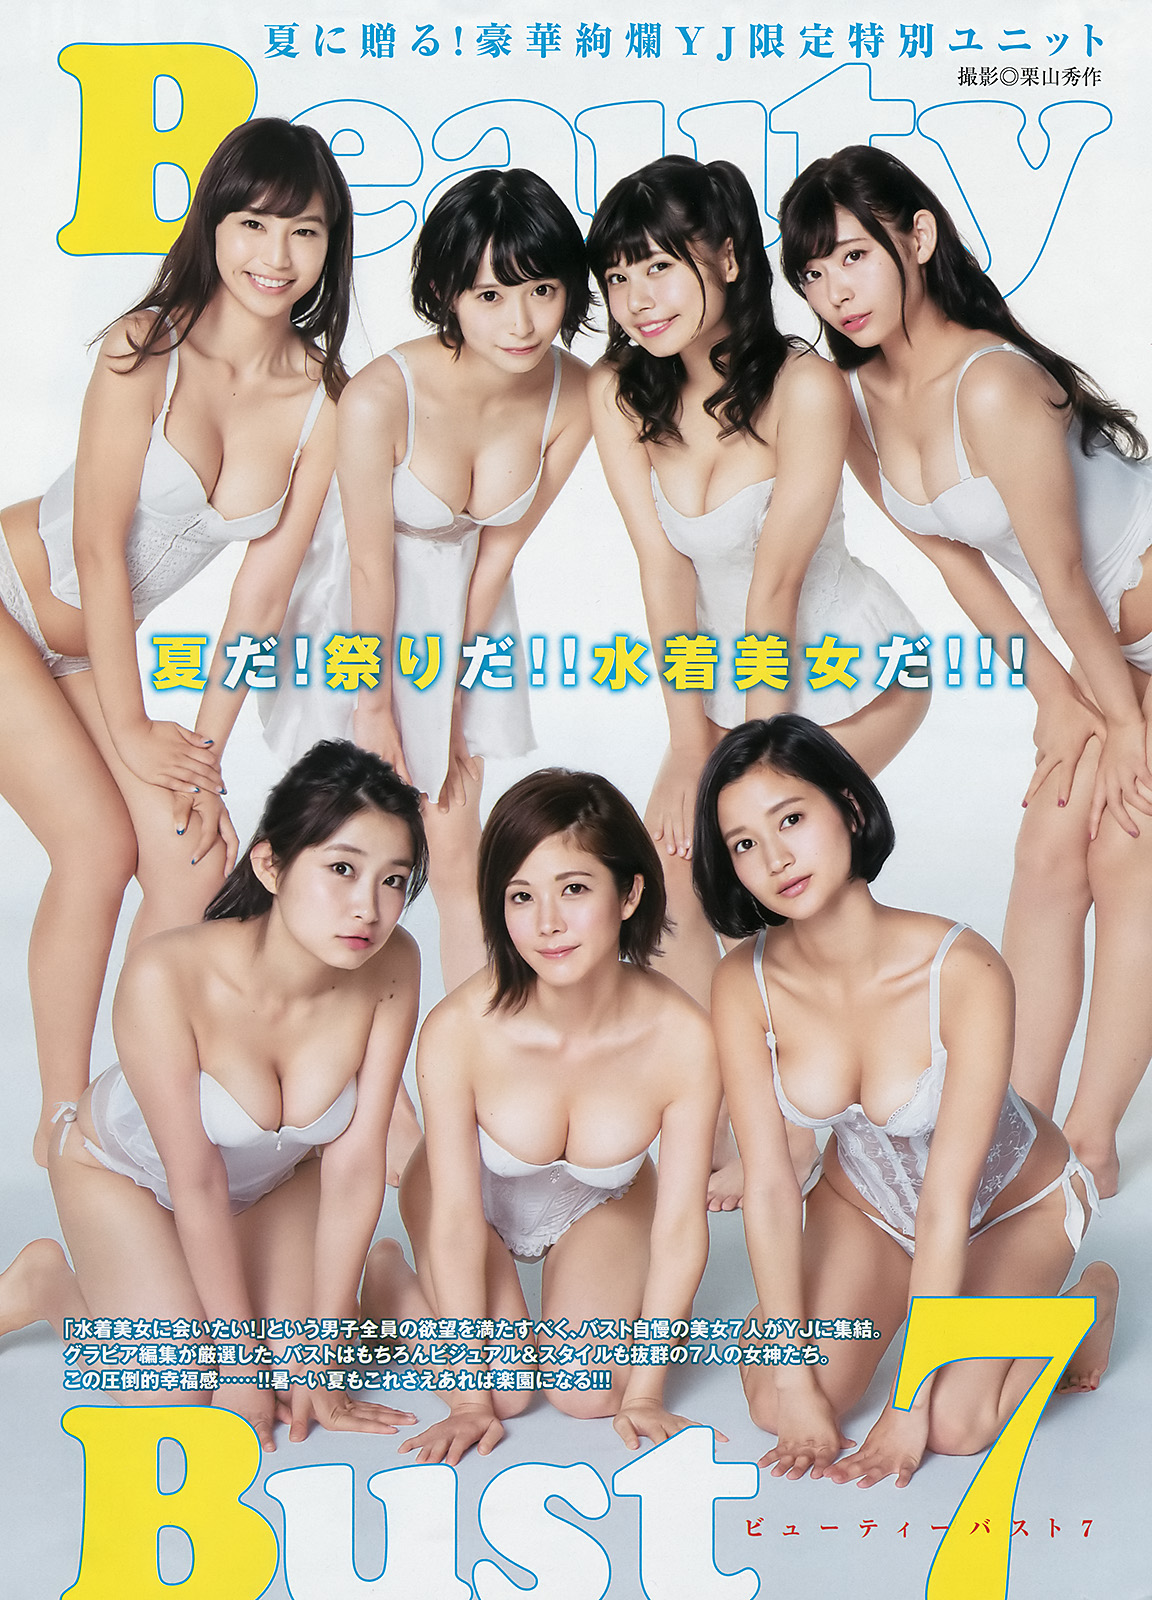 Beauty Bust 7, Young Jump 2017 No.38 (週刊ヤングジャンプ 2017年38号)